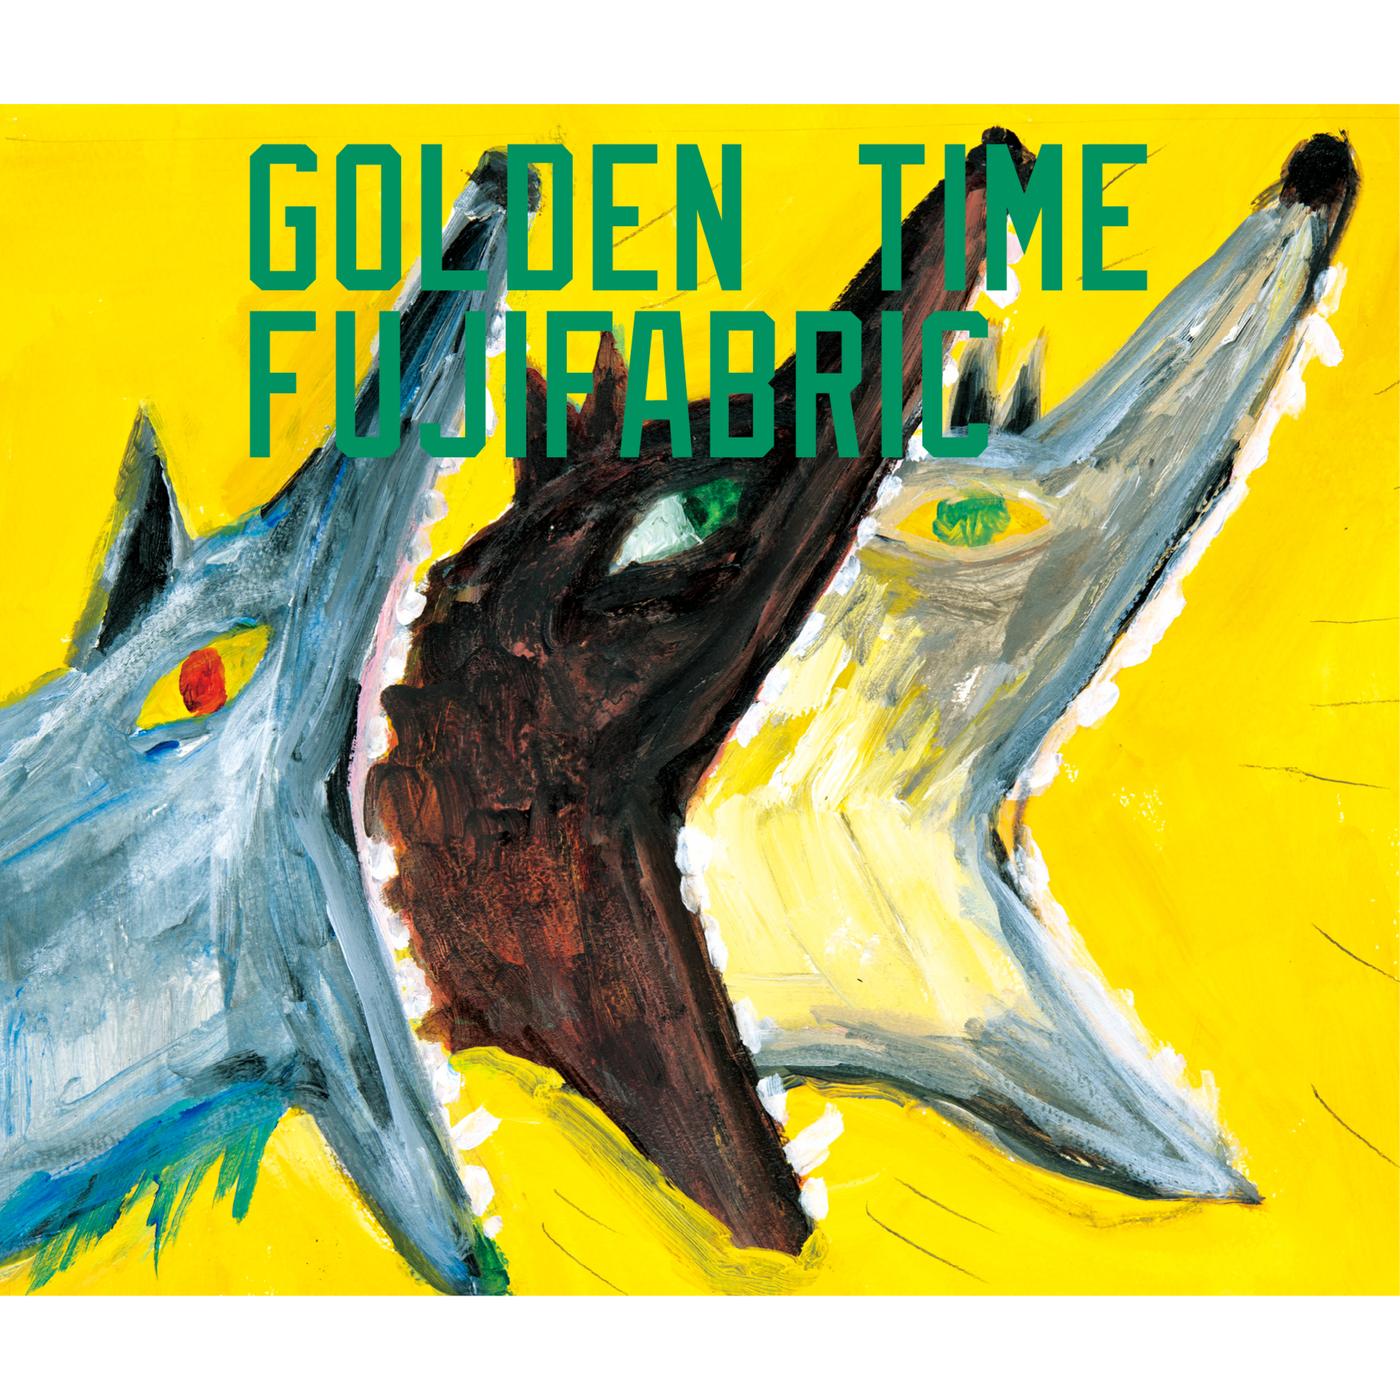 Golden Time - Fujifabric